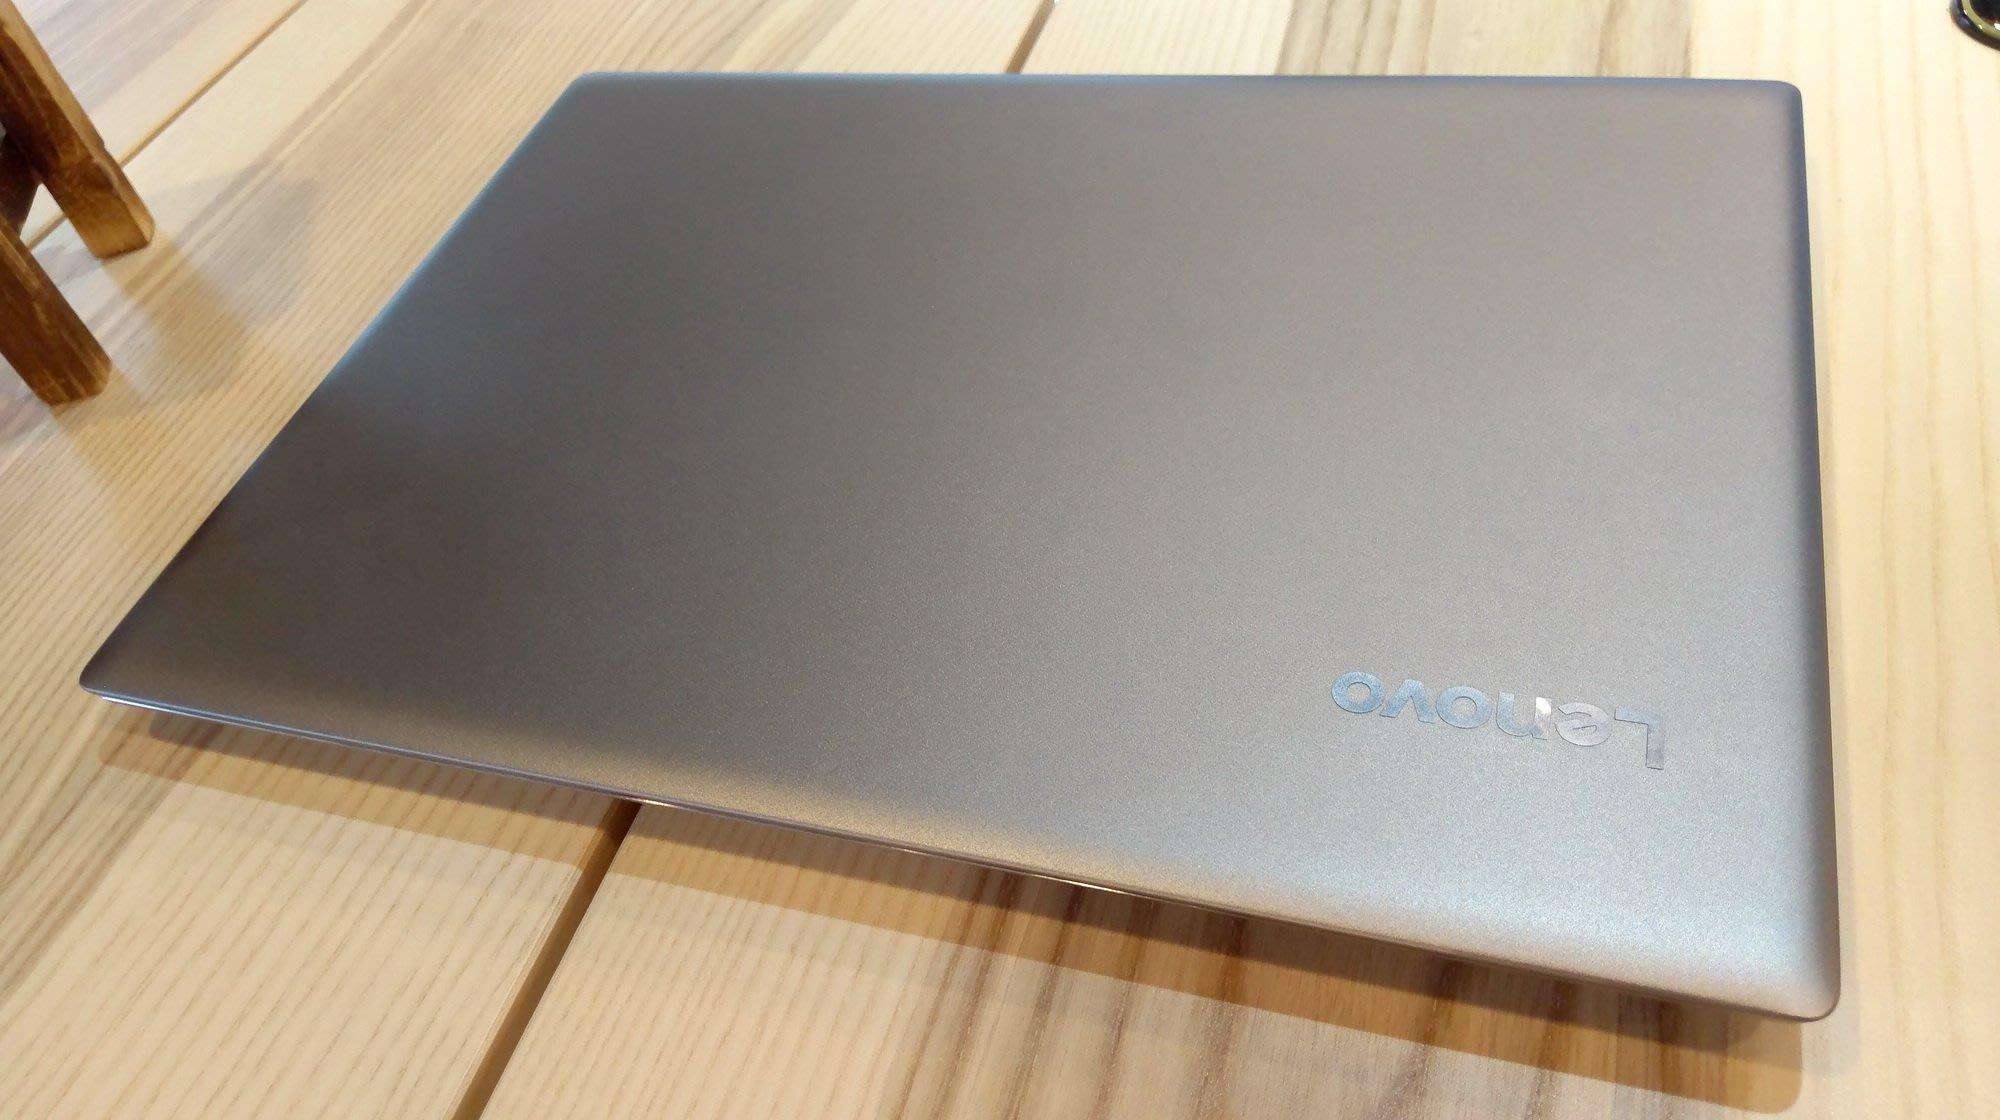 清倉【LENOVO】520s (i5-7200U/8G/1TB/GT940M/W10/14吋/FHD)出清14800!